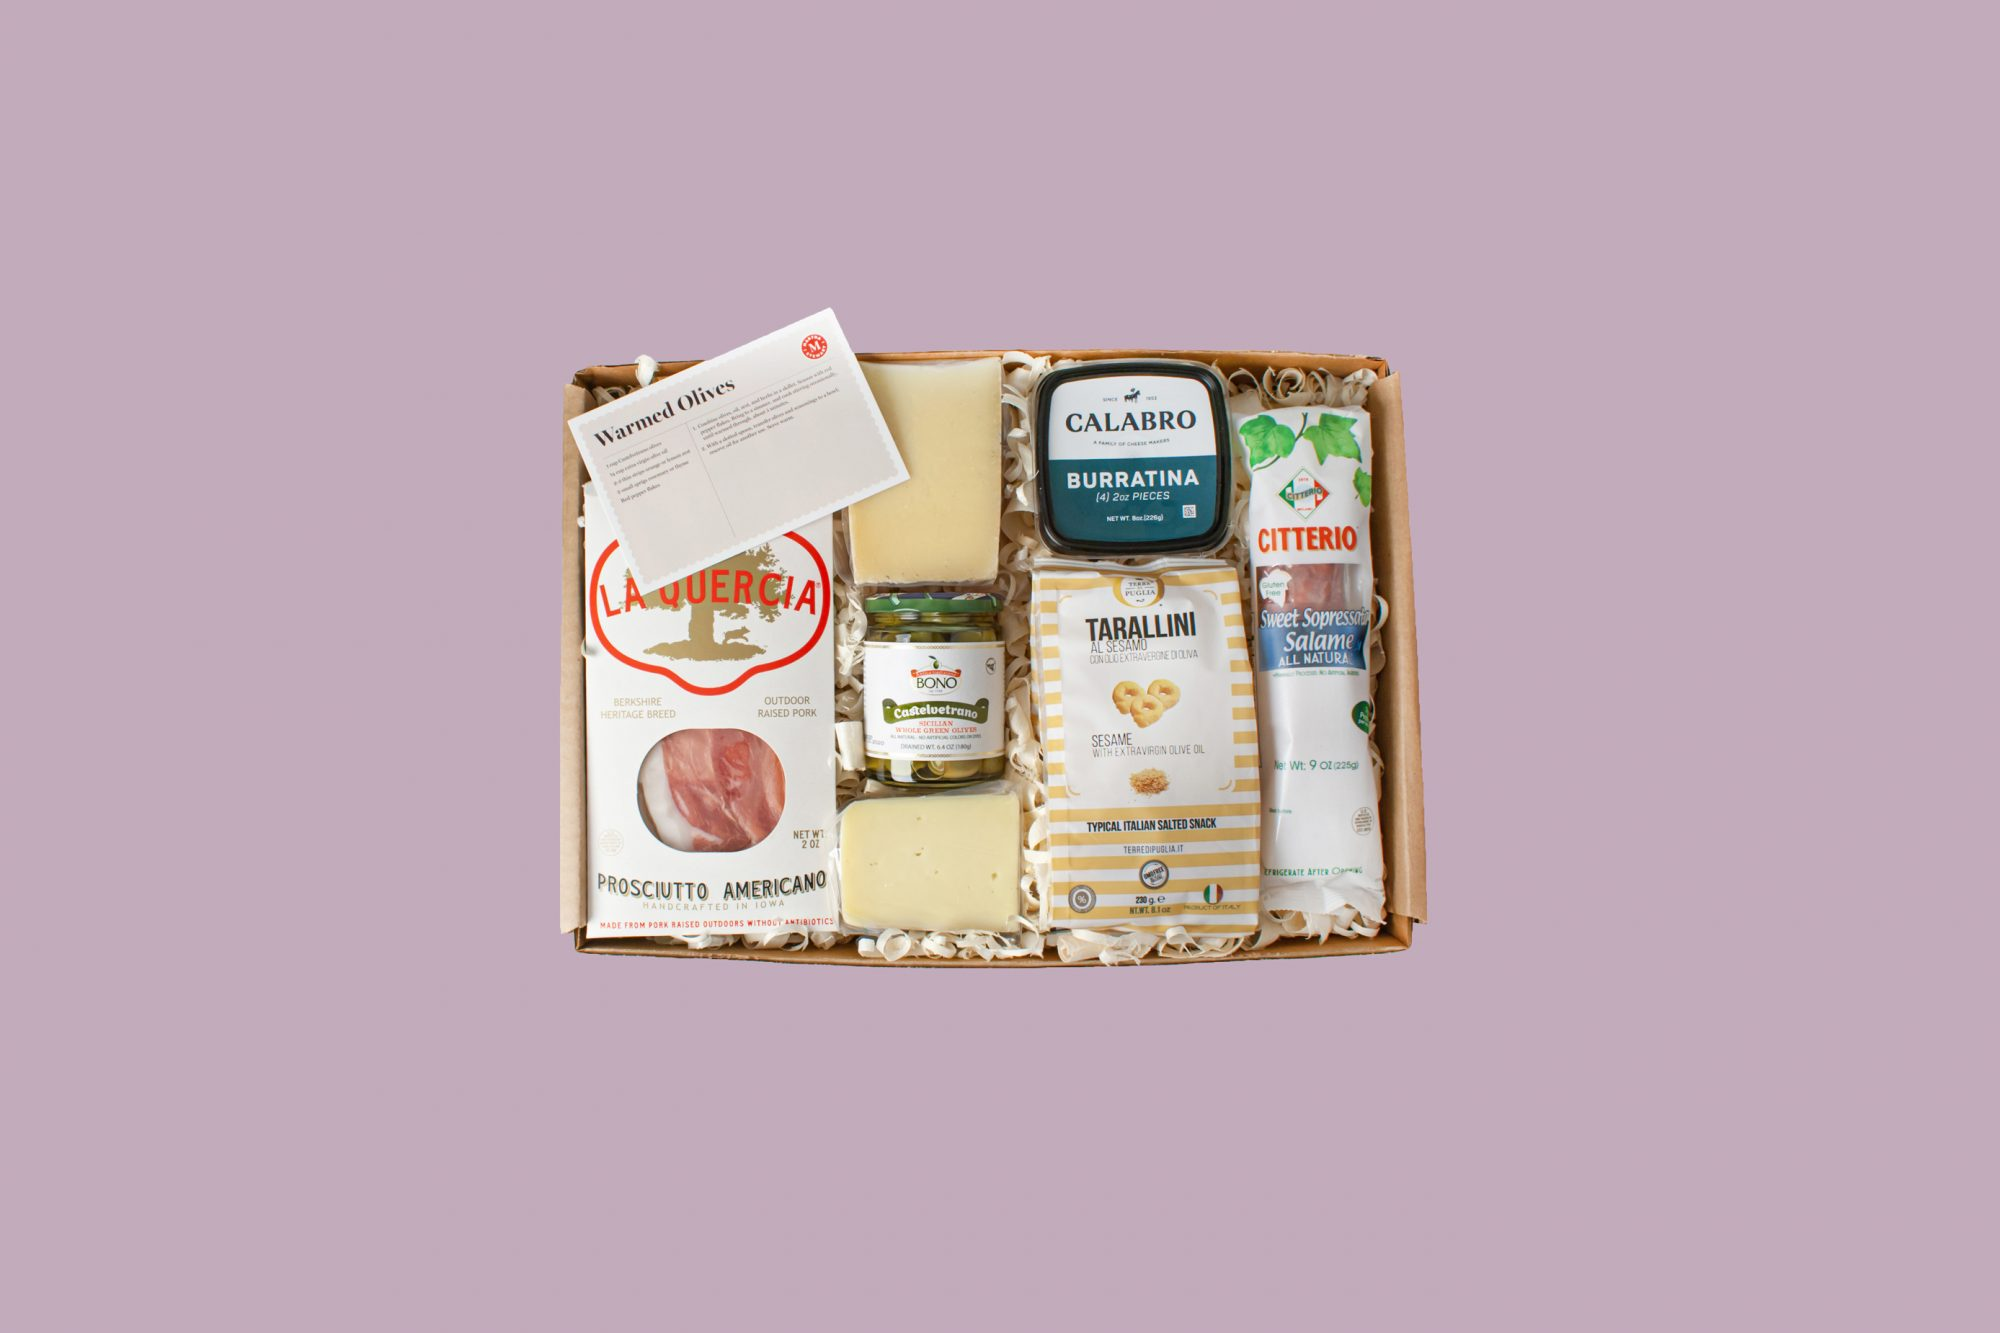 snack food gift kit